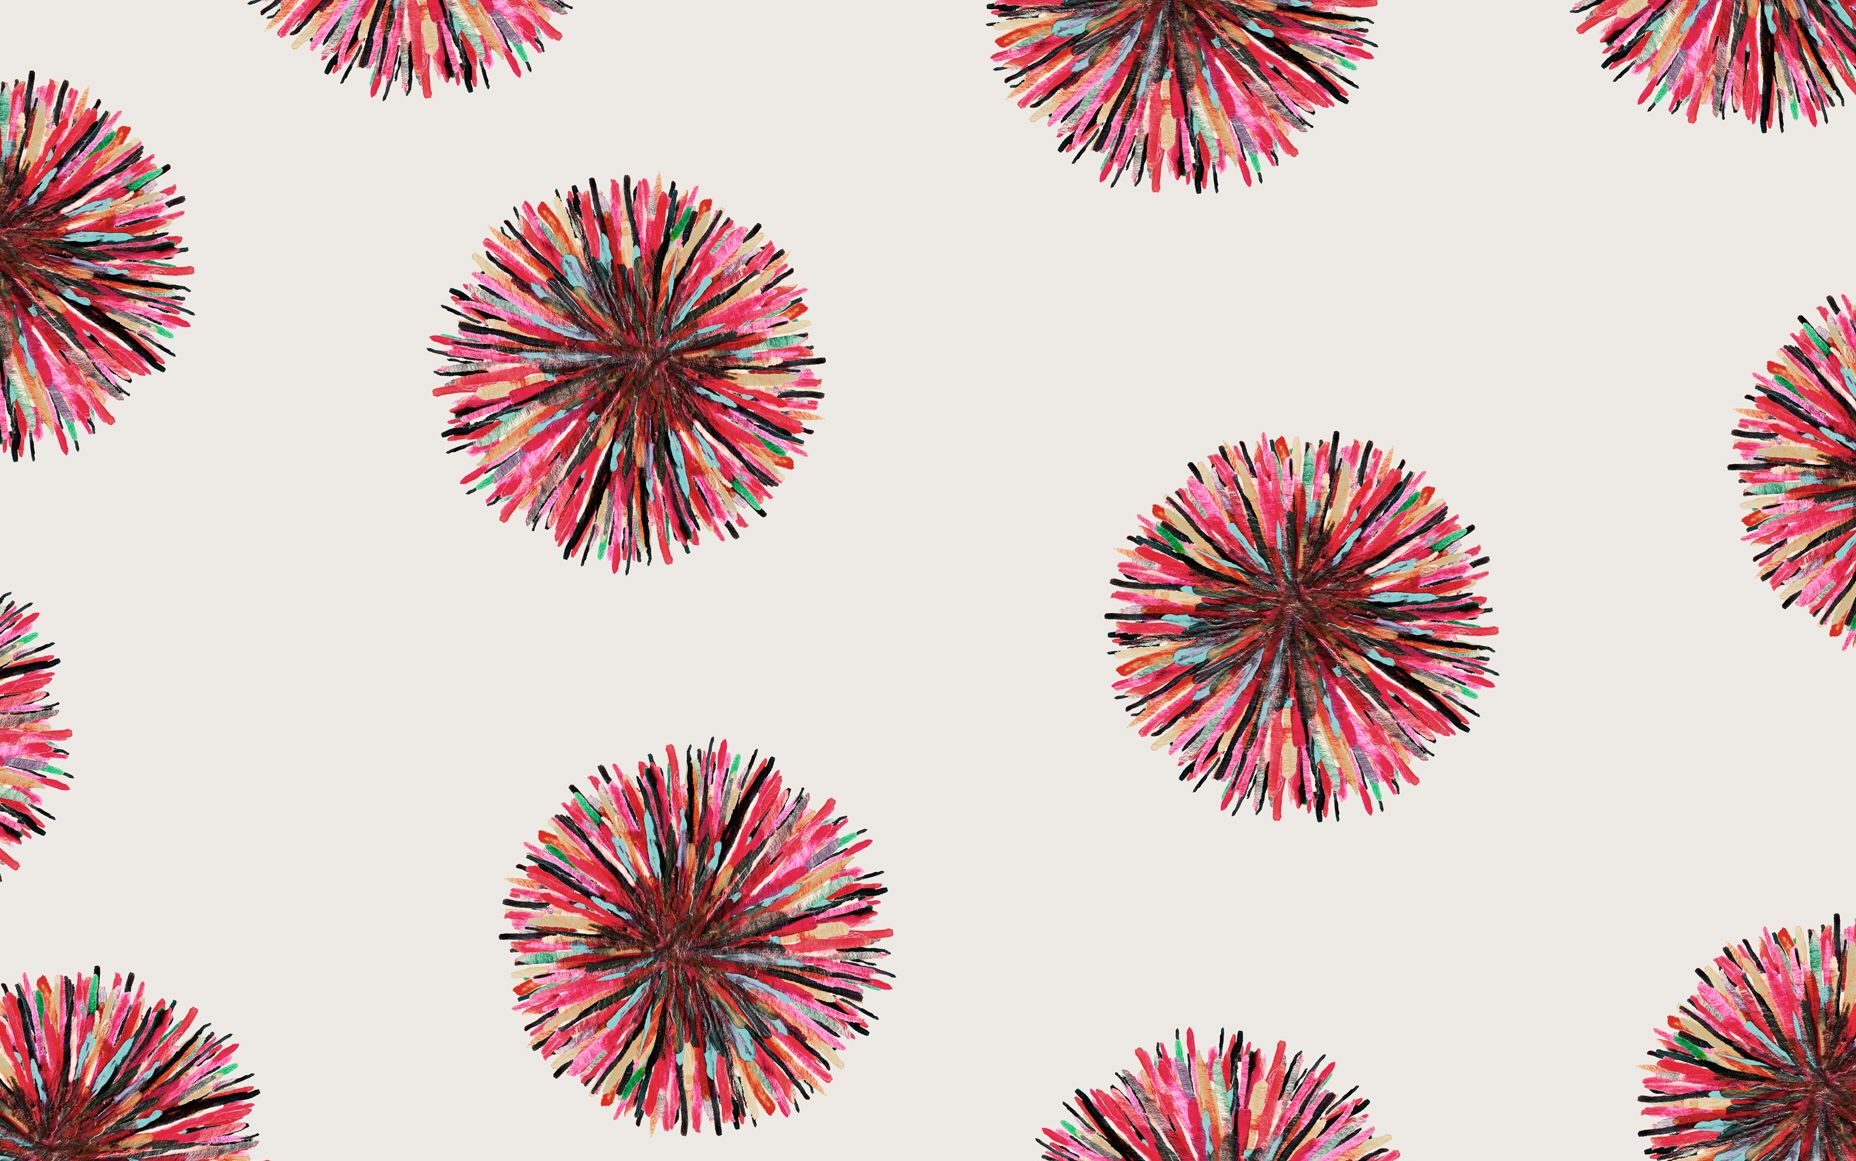 Pin By Phia On Art Medical Stuffs Watercolor Desktop Wallpaper Macbook Wallpaper Free Desktop Wallpaper